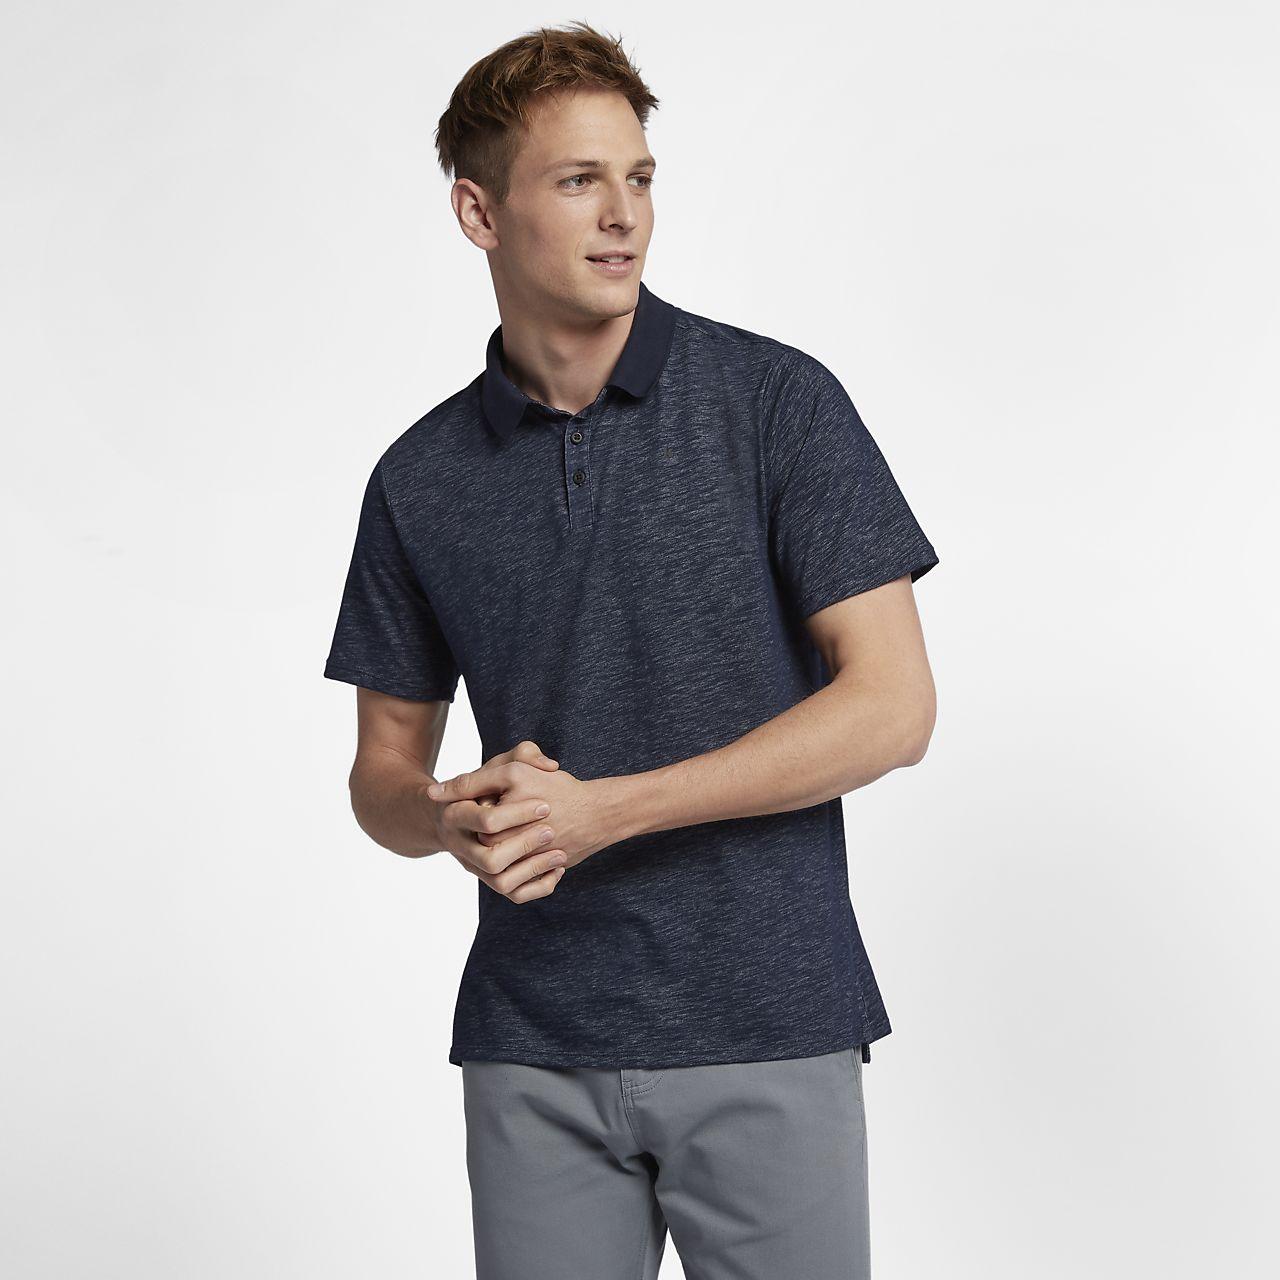 Hurley Dri-FIT Lagos Kurzarm-Poloshirt für Herren